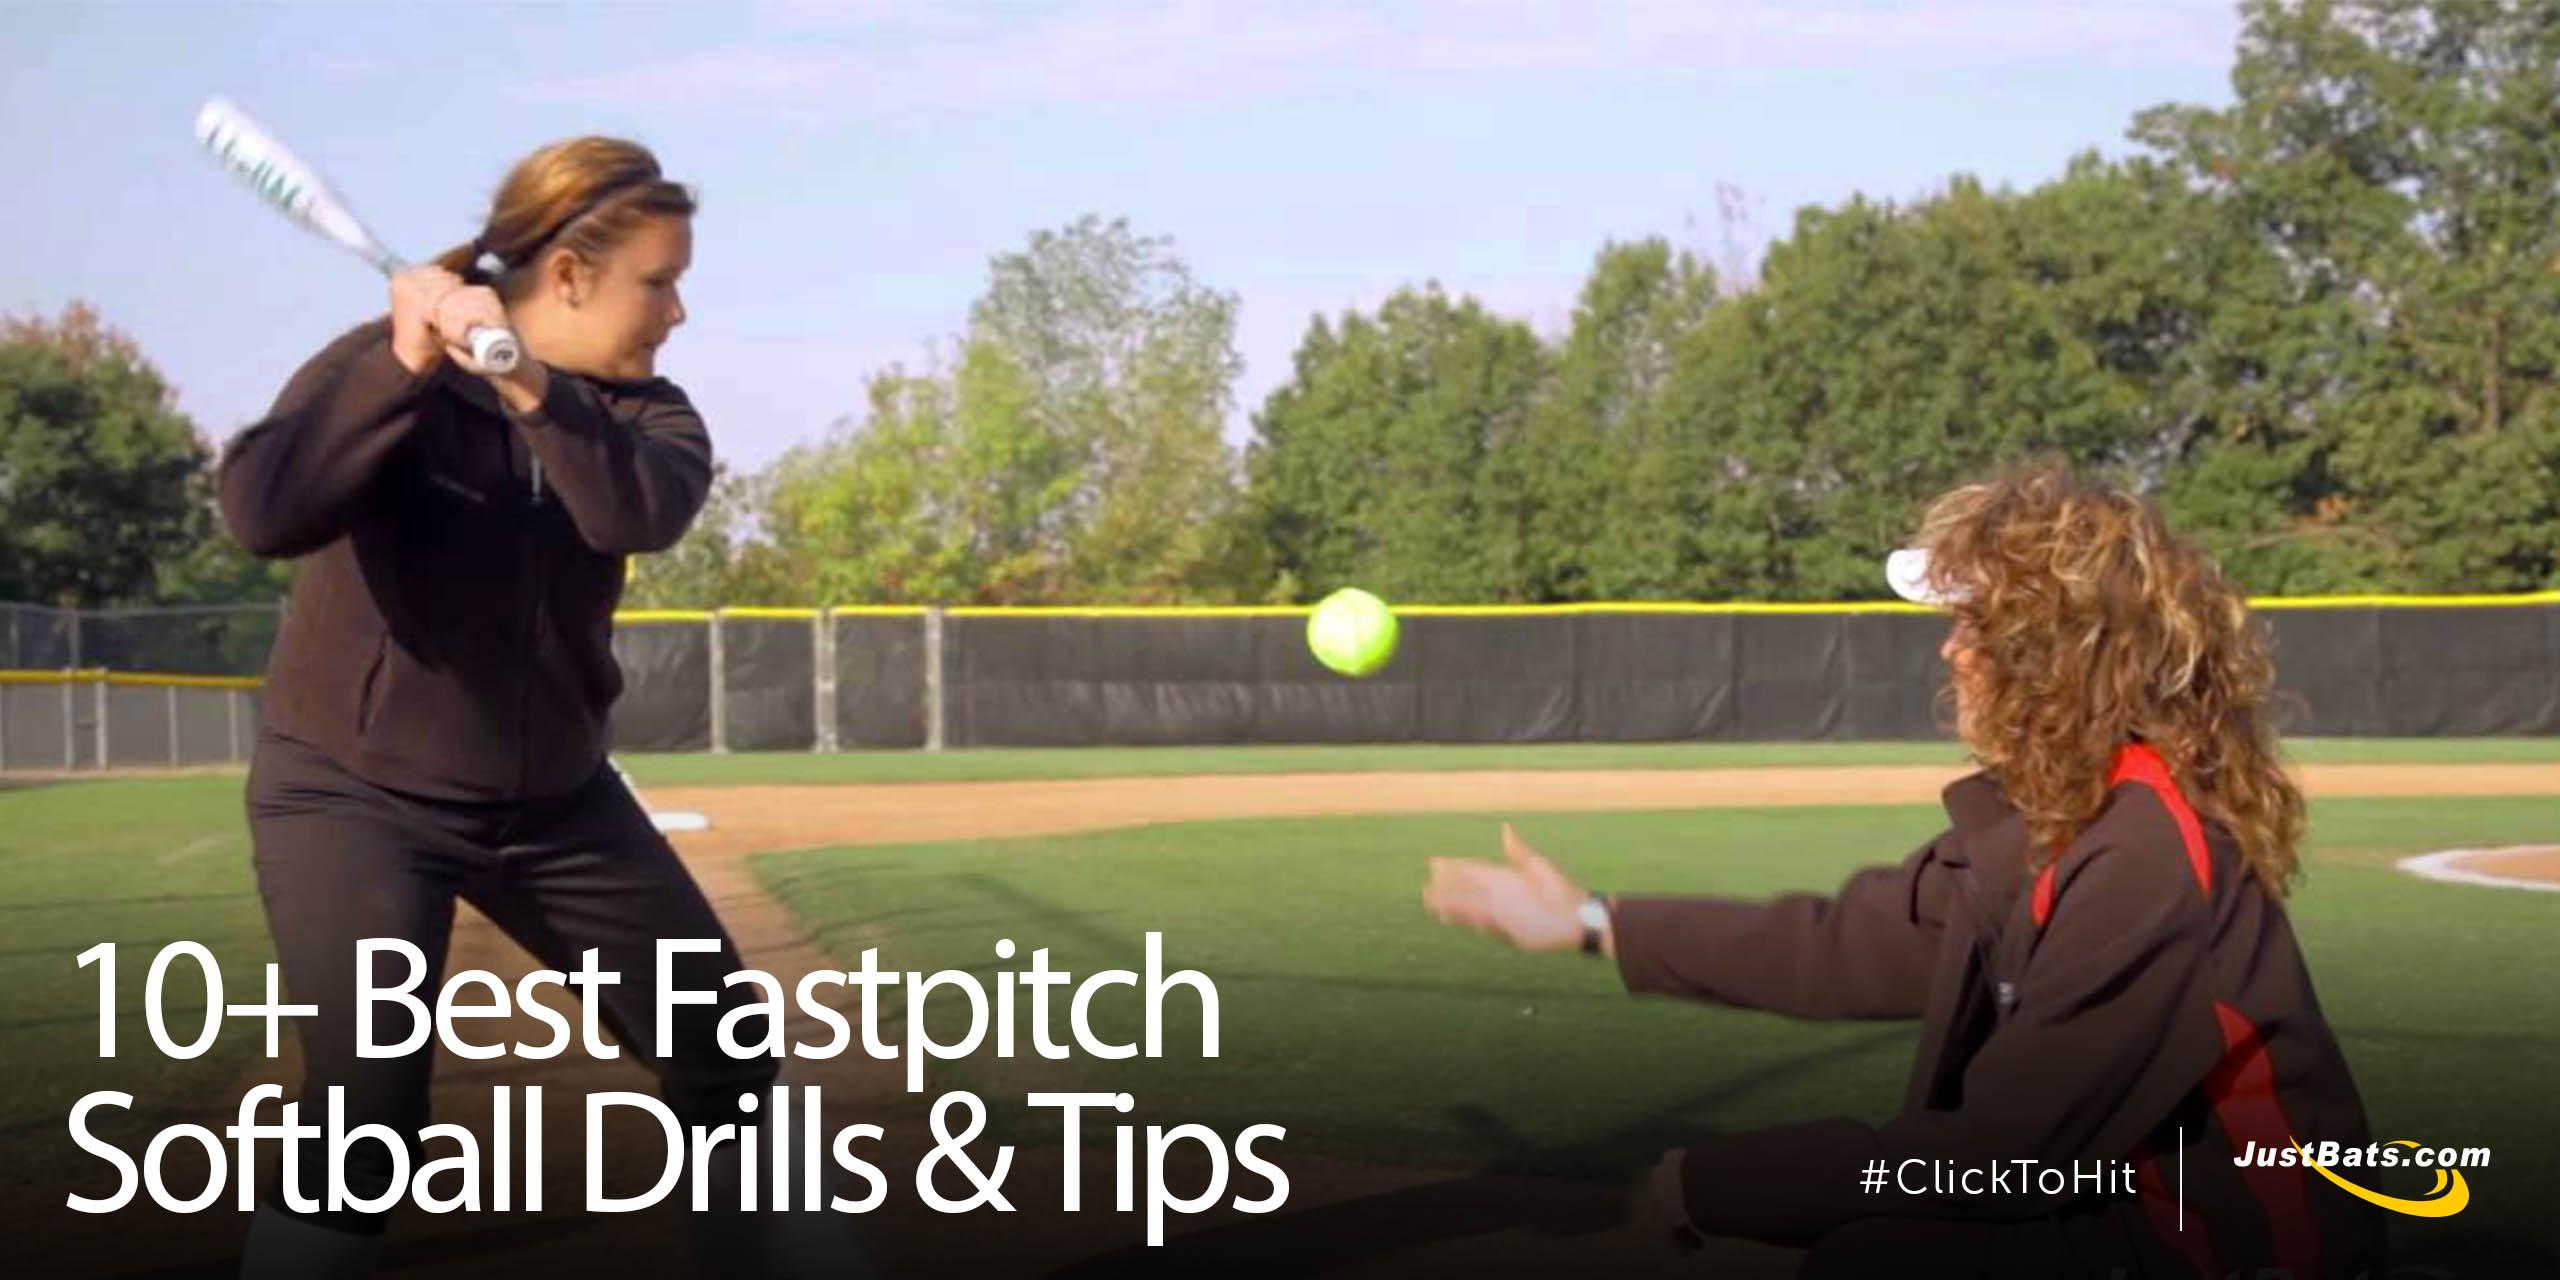 10+ Best Fastpitch Softball Drills - Blog.jpg